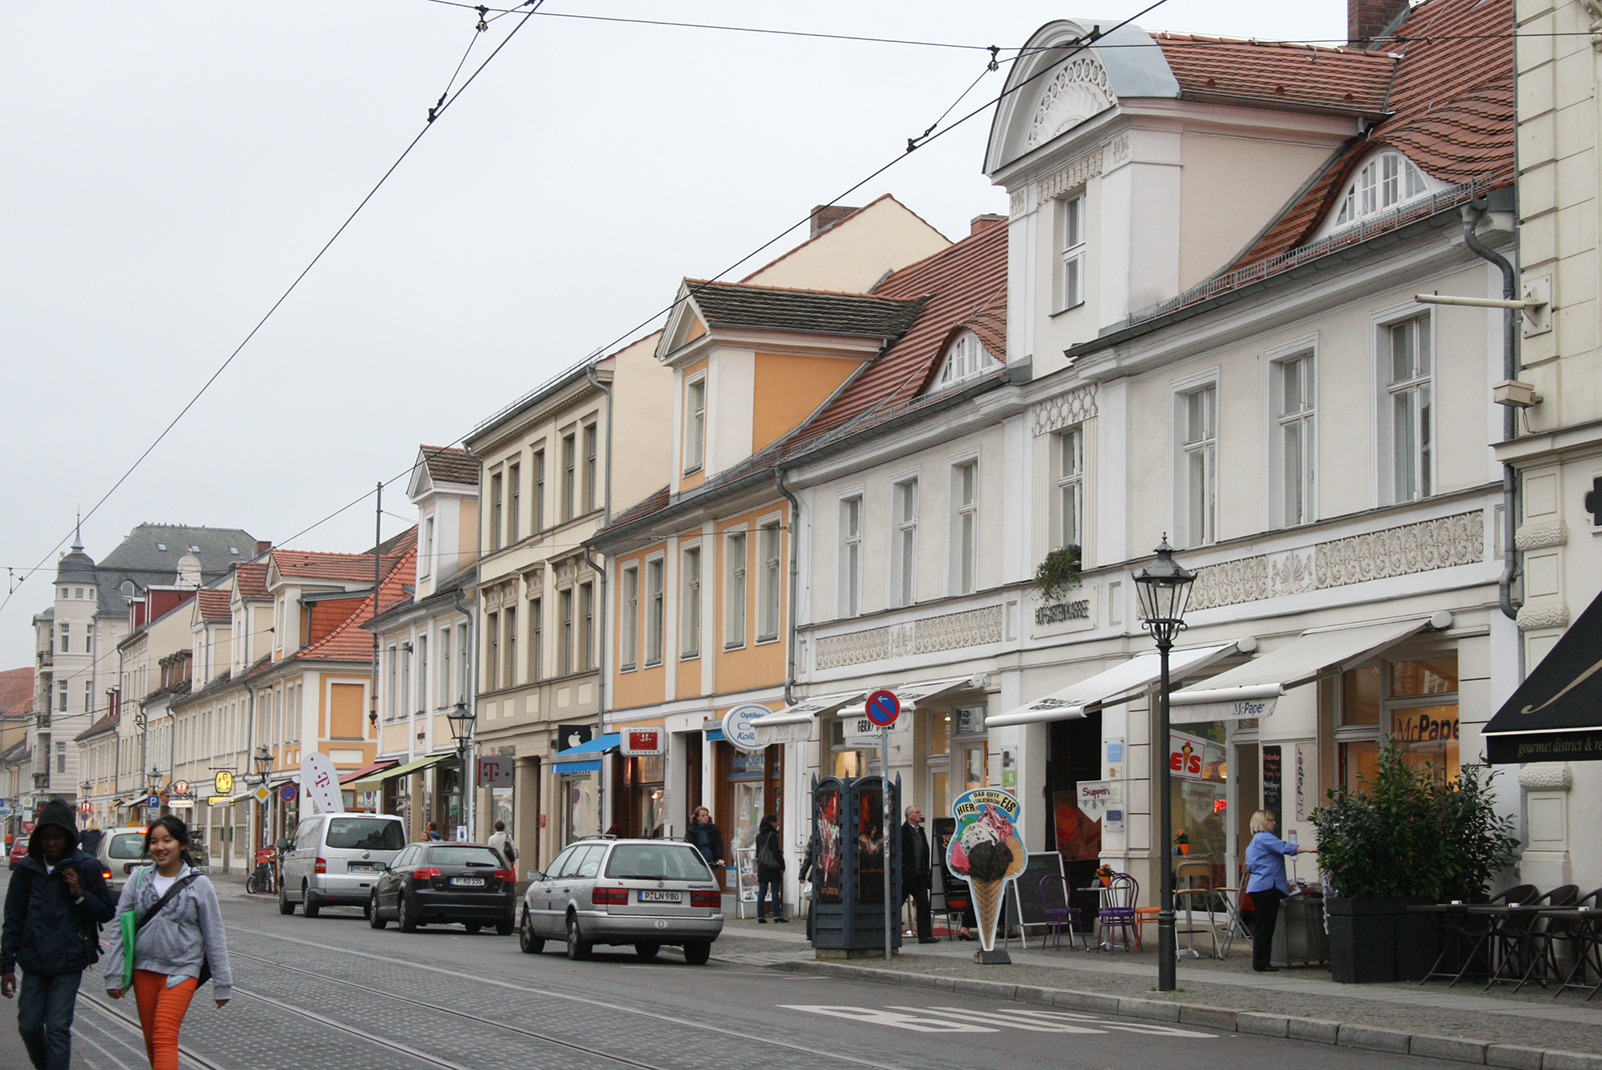 Potsdam_Holandish2